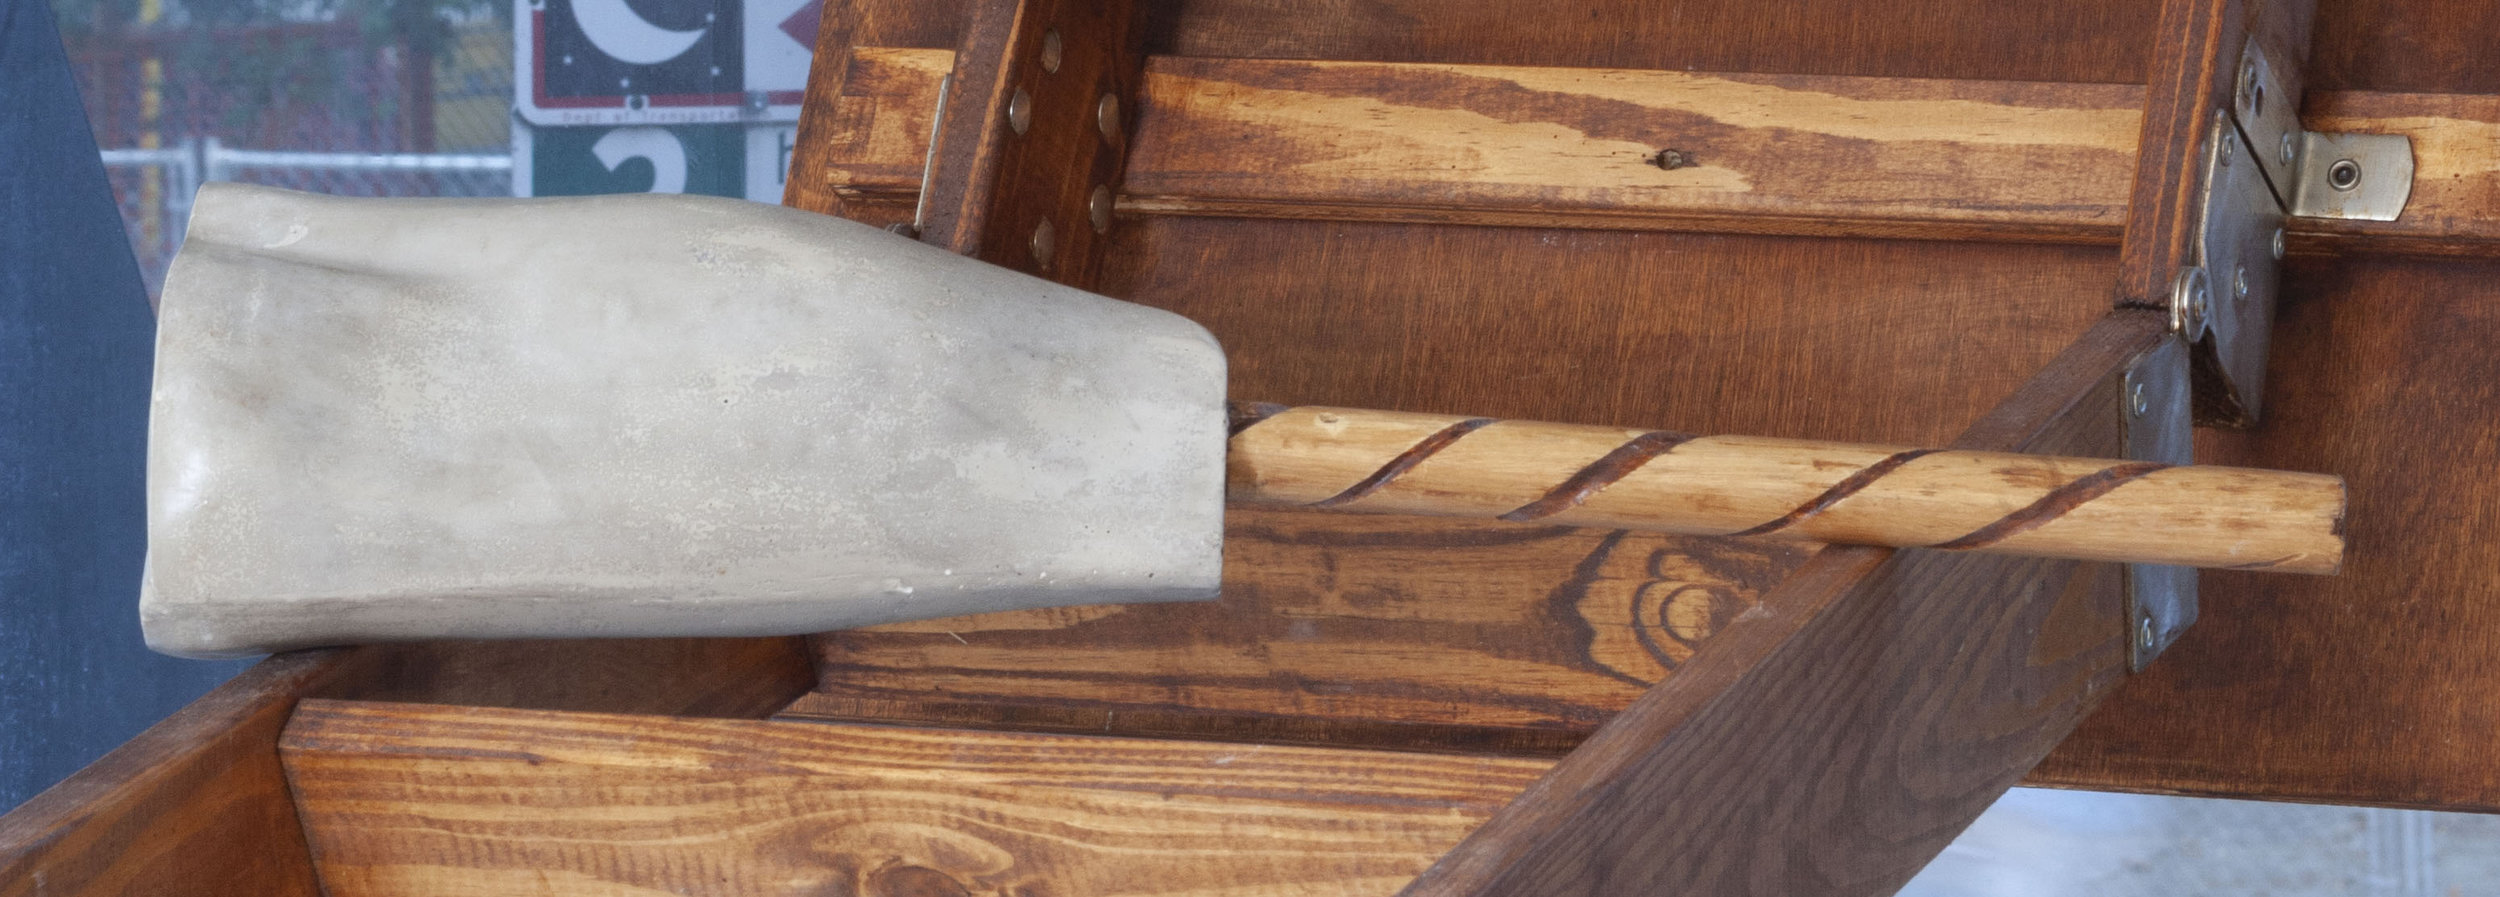 Half Limb 2, Cement, Plaster, Wood Cane 2019